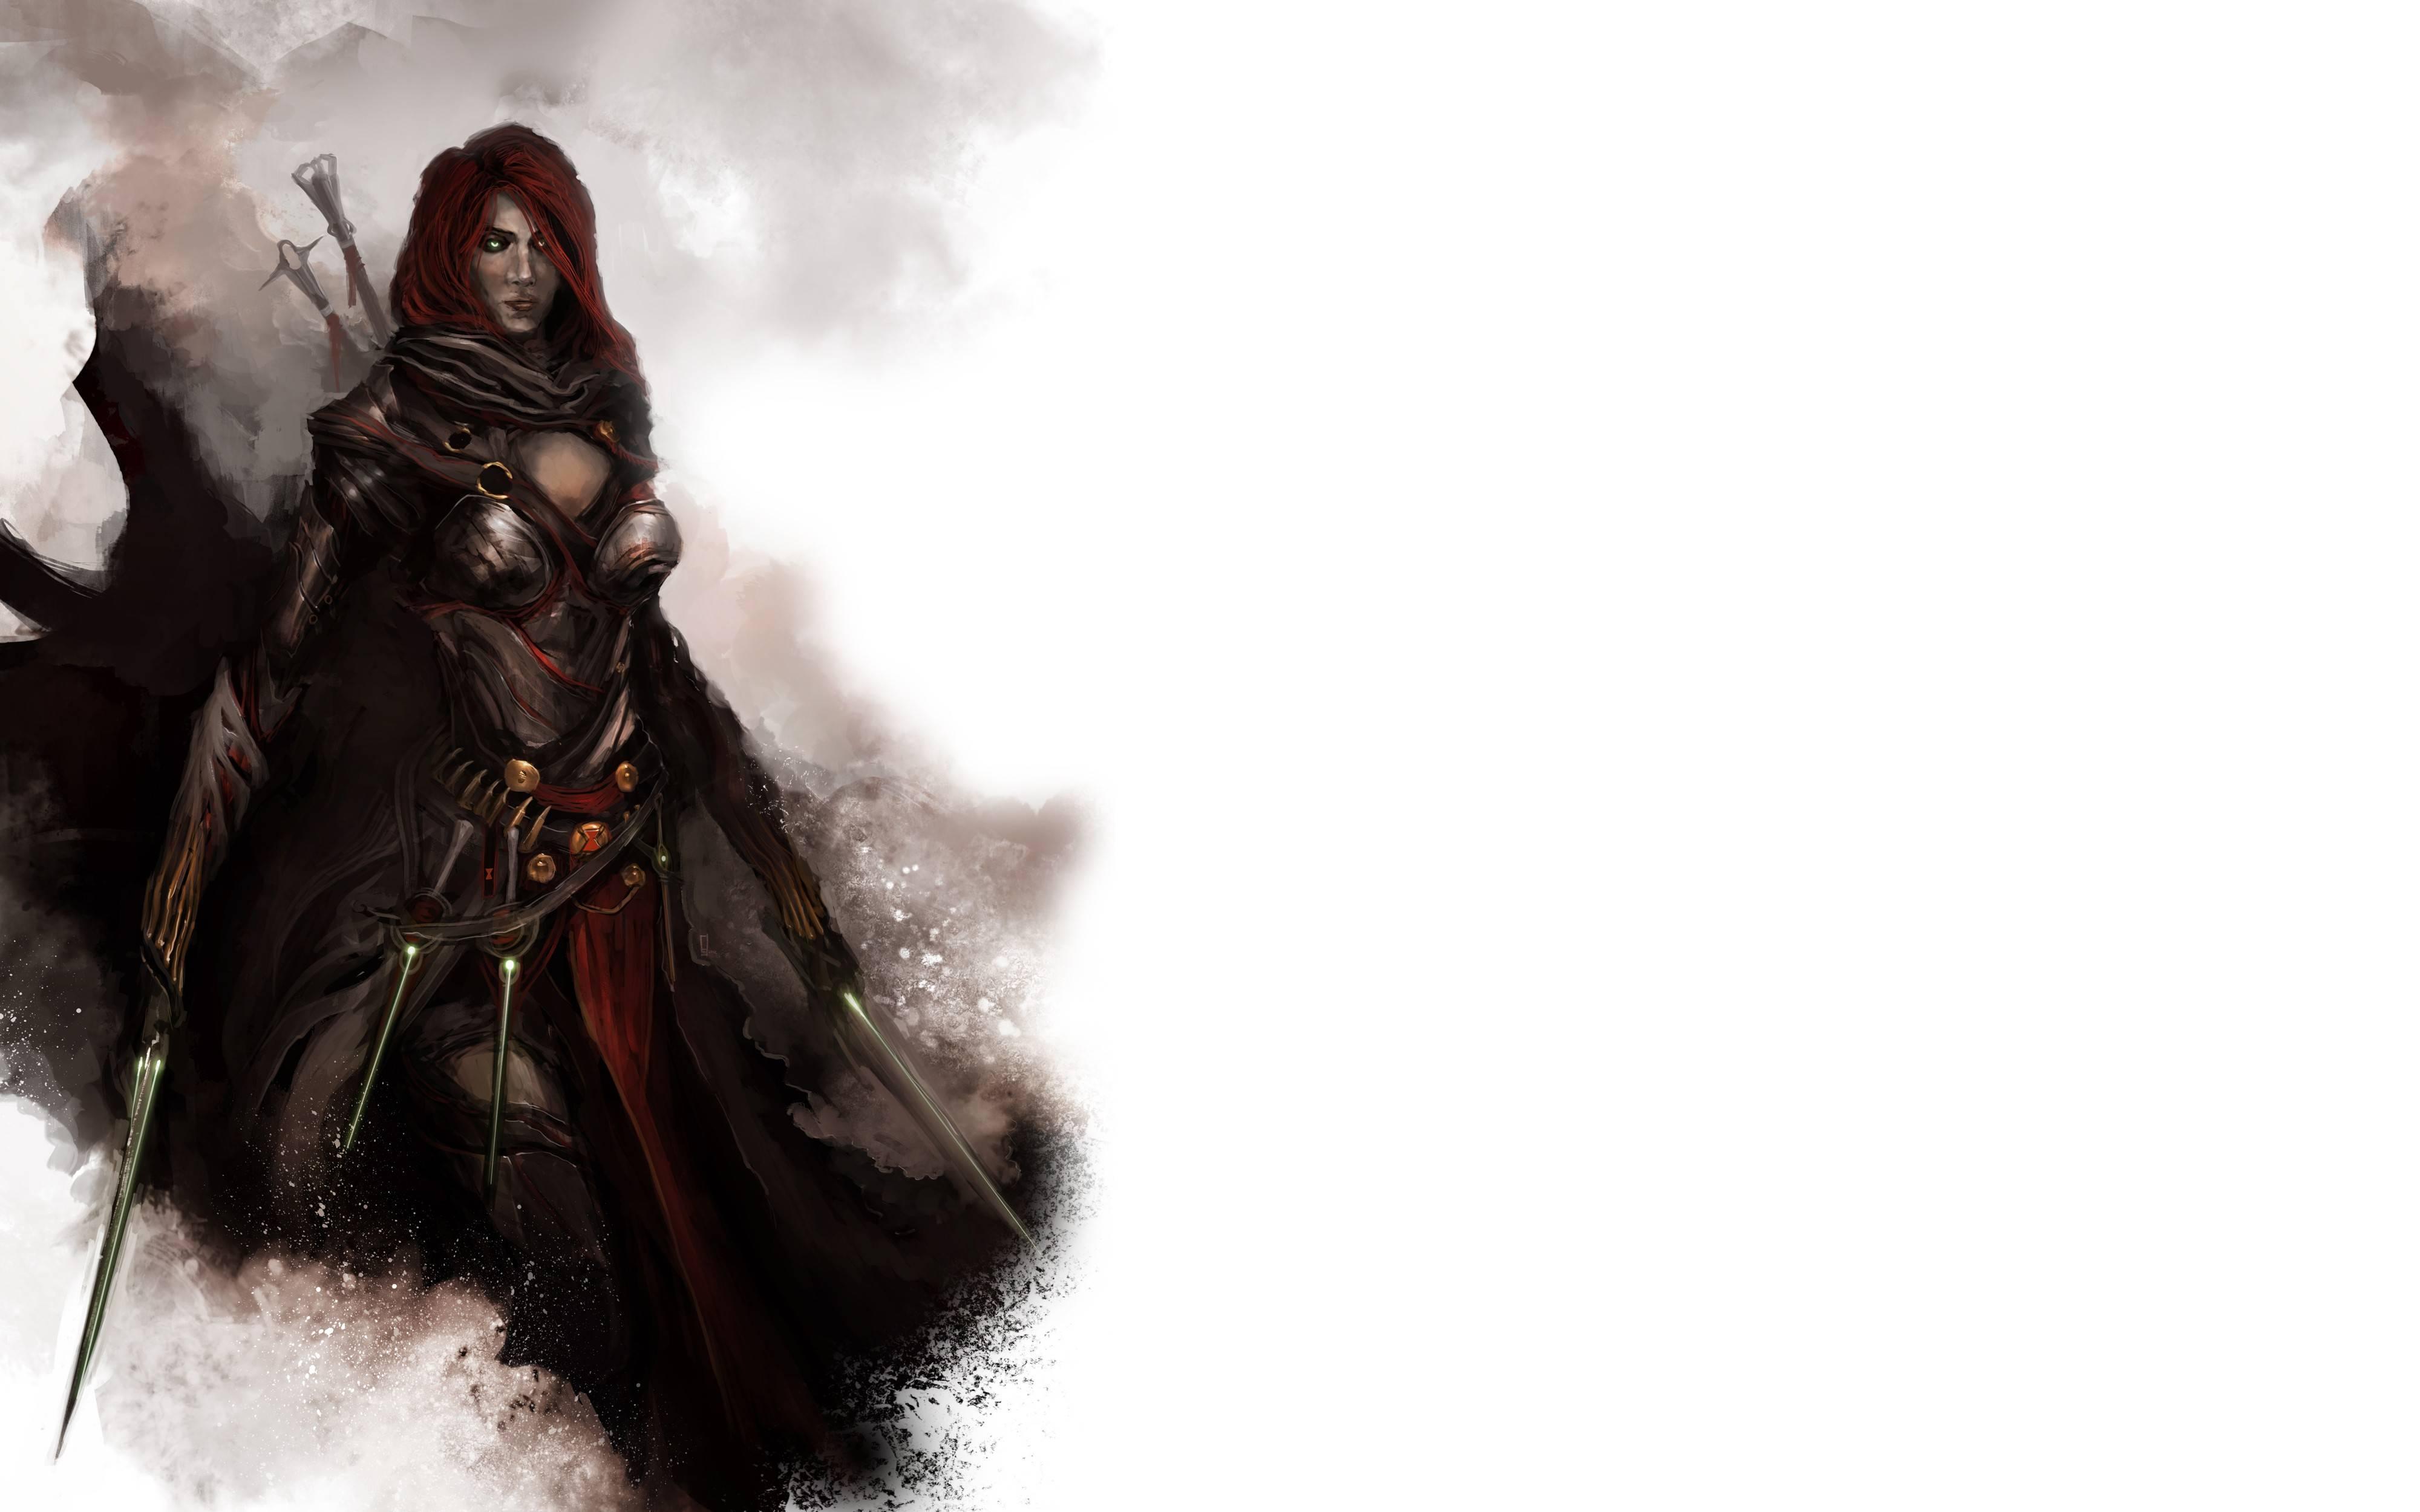 Black Widow 40002500 Wallpaper 2312220 4000x2500